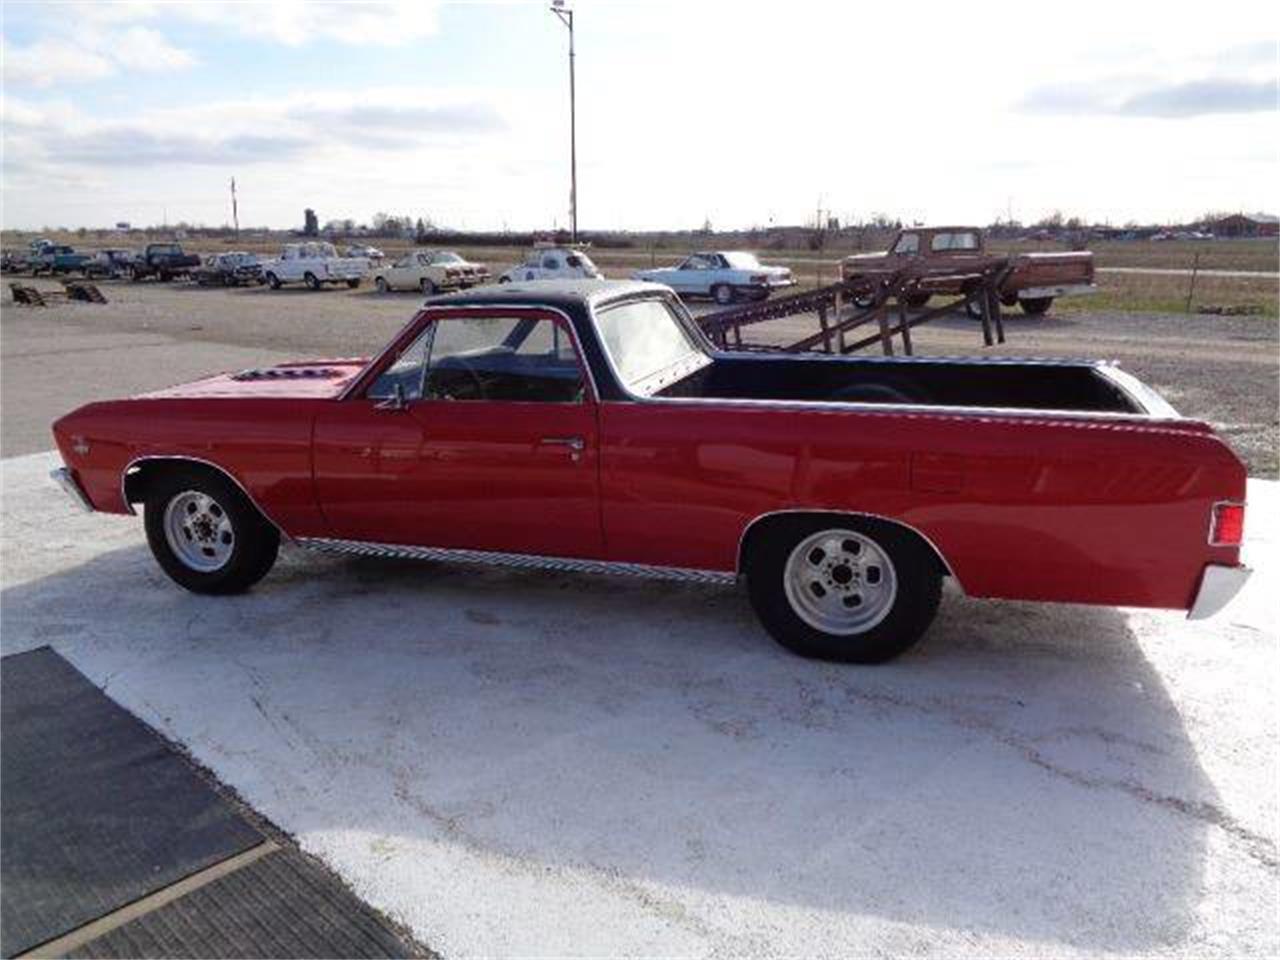 1967 Chevrolet El Camino (CC-1334442) for sale in Staunton, Illinois